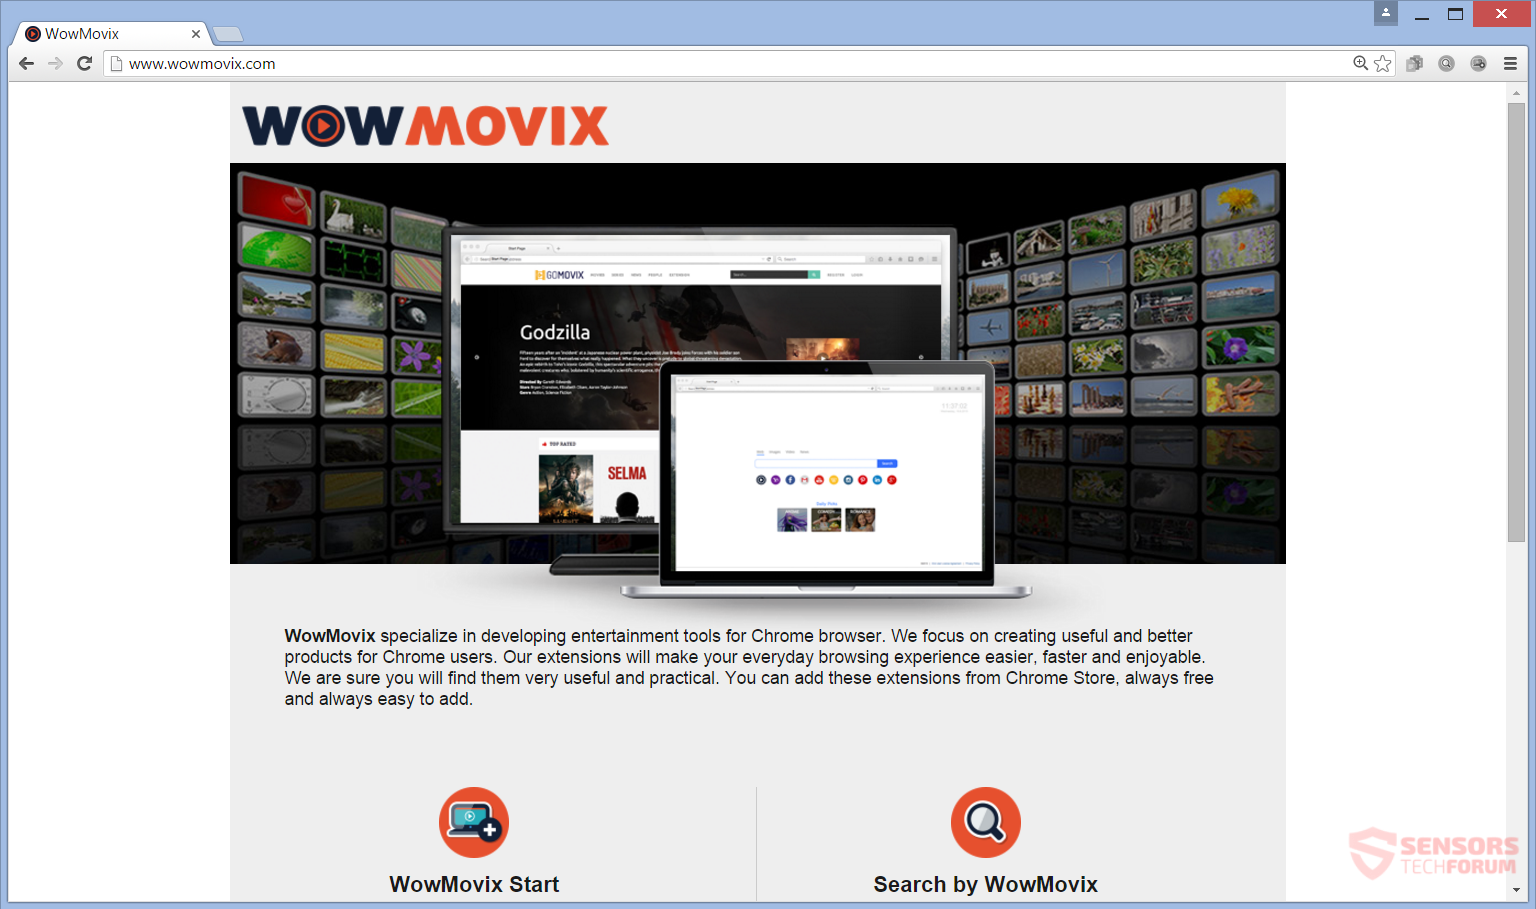 STF-wowmovix-gomovix-com-wow-movix-searchalgo-com-search-algo-main-site-hijacker